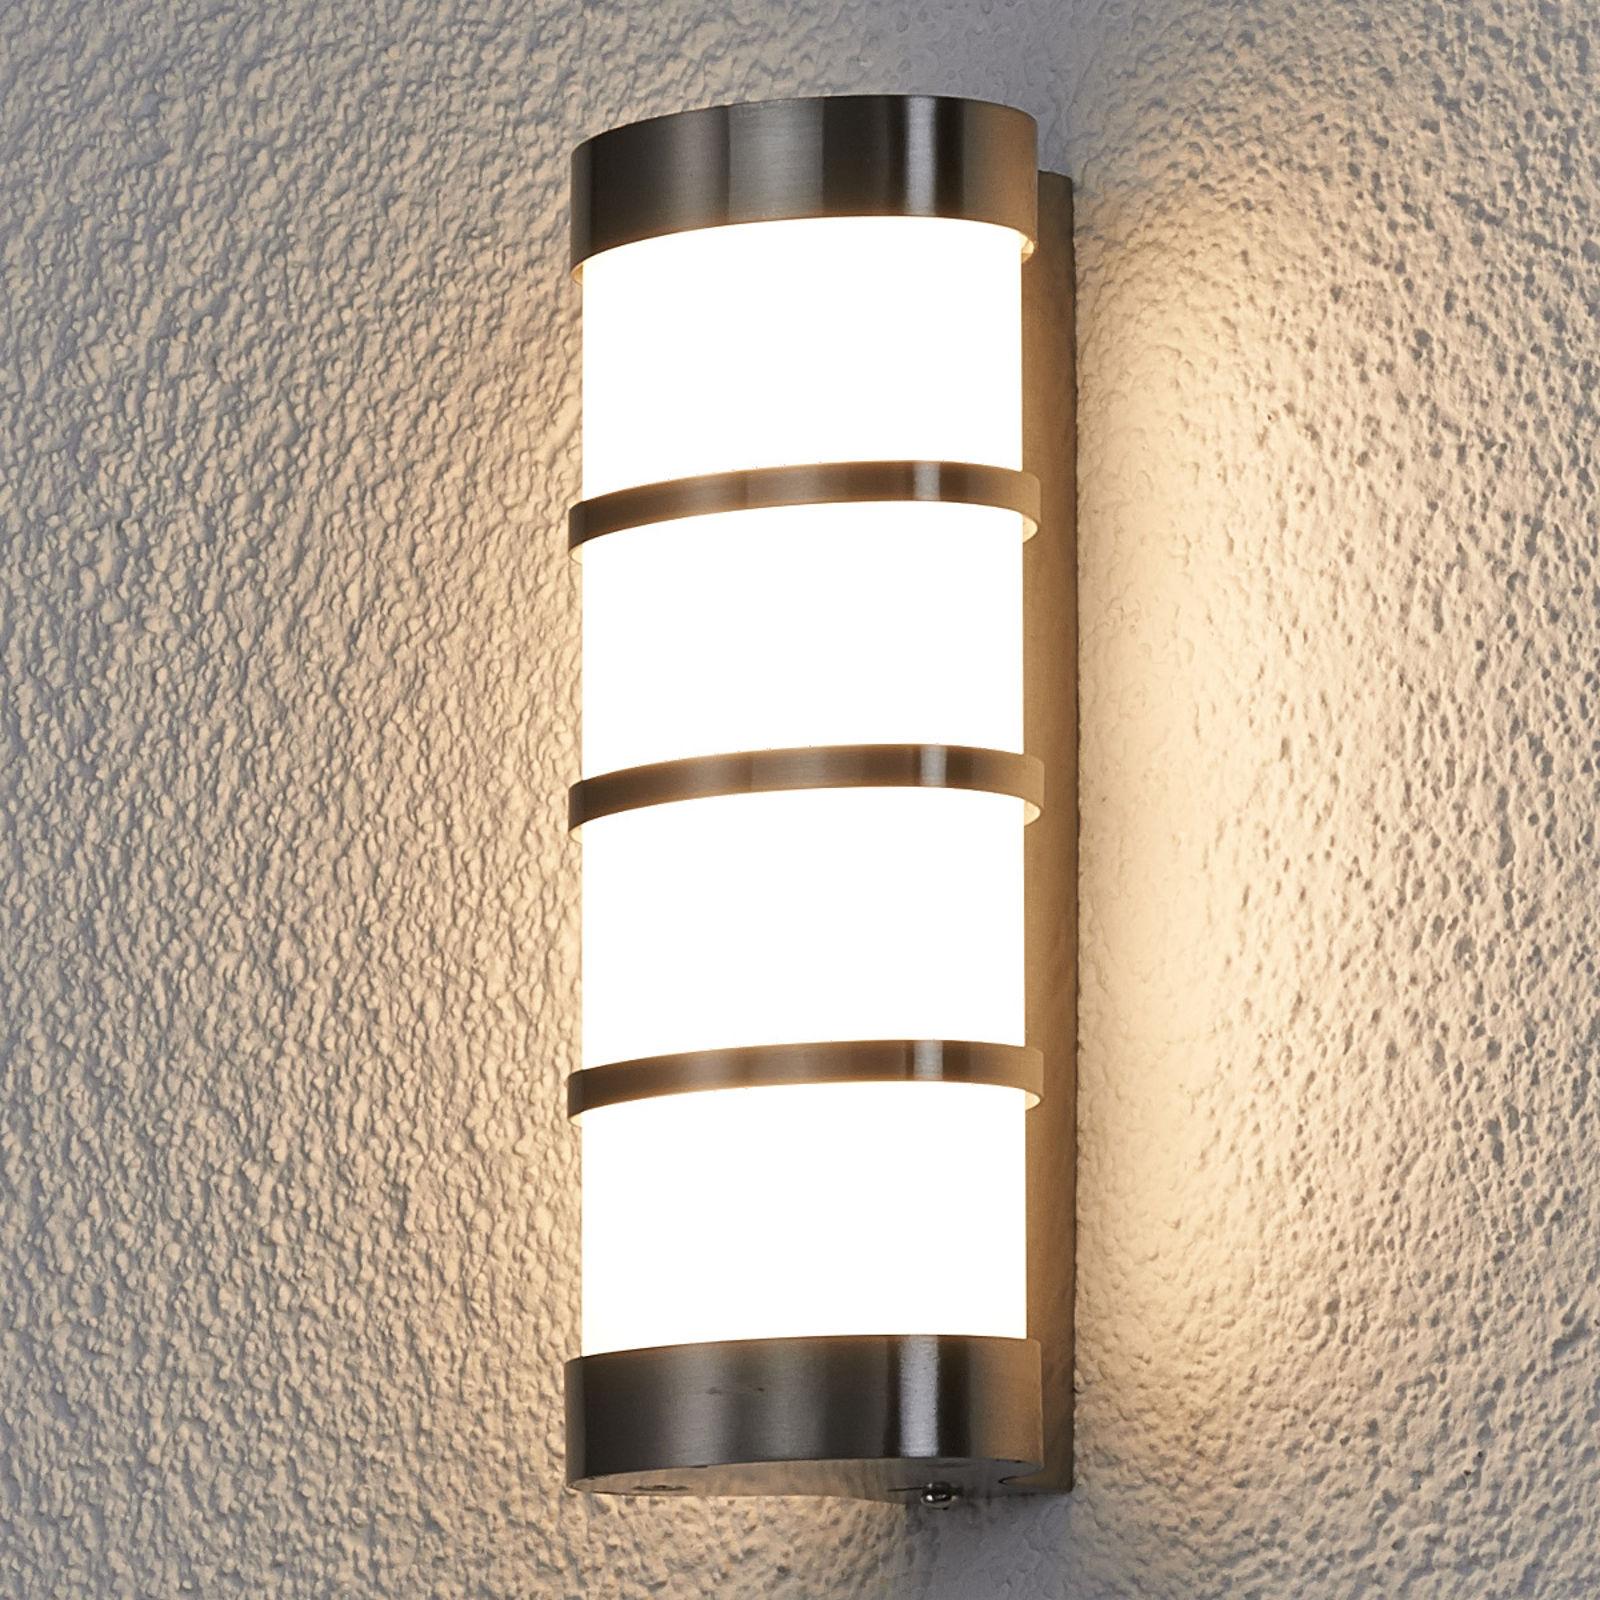 Lampa zewnętrzna LED Leroy, stal szl.